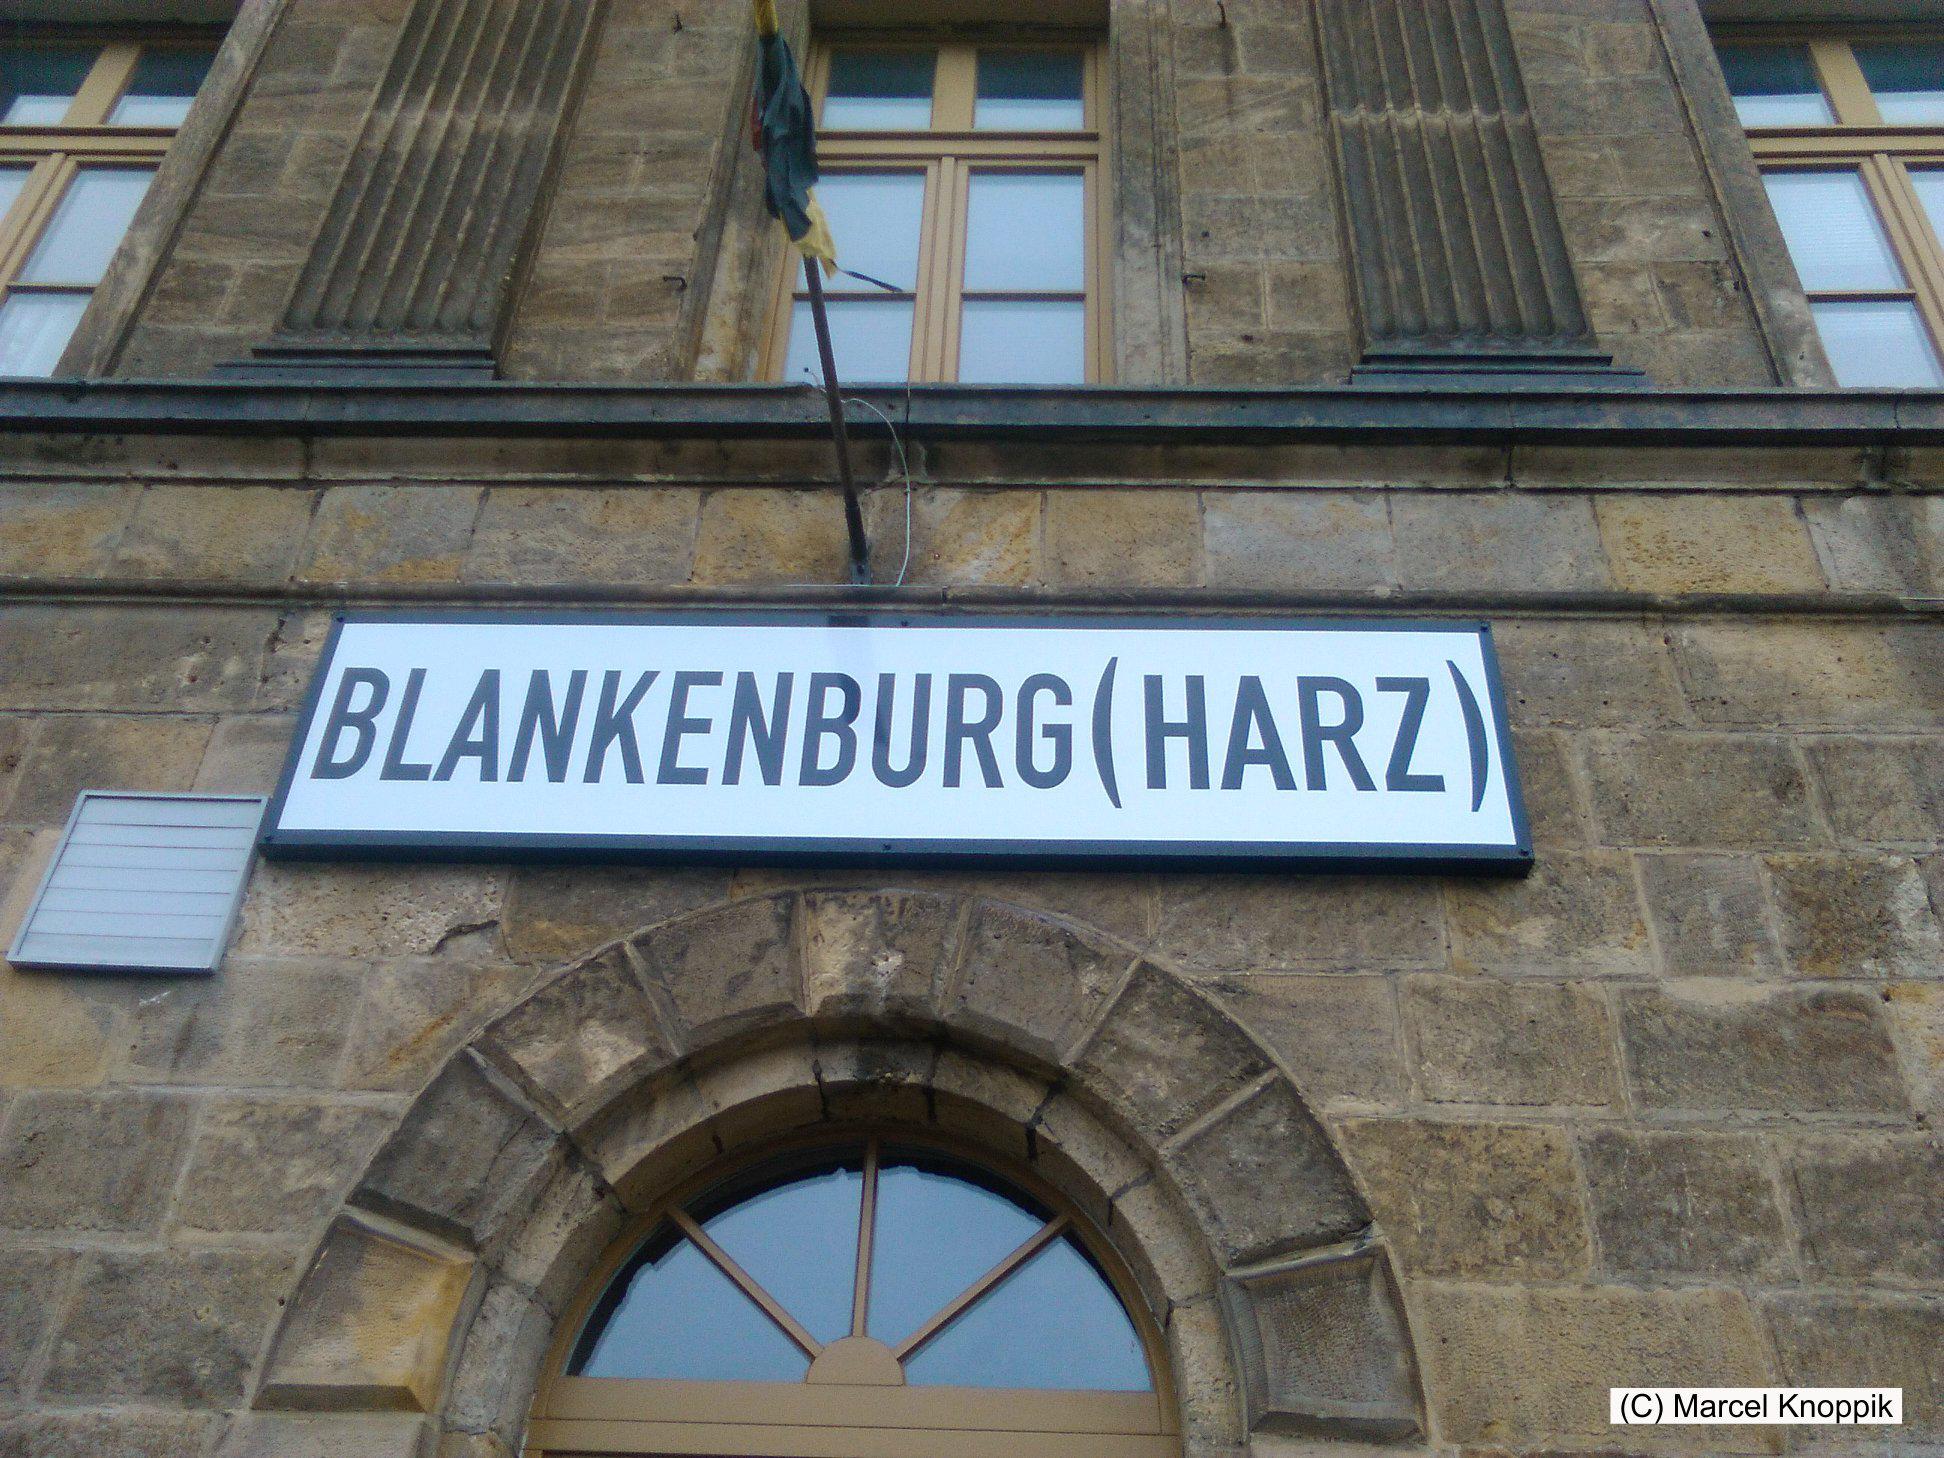 Bahnhof Blankenburg der Rübelandbahn